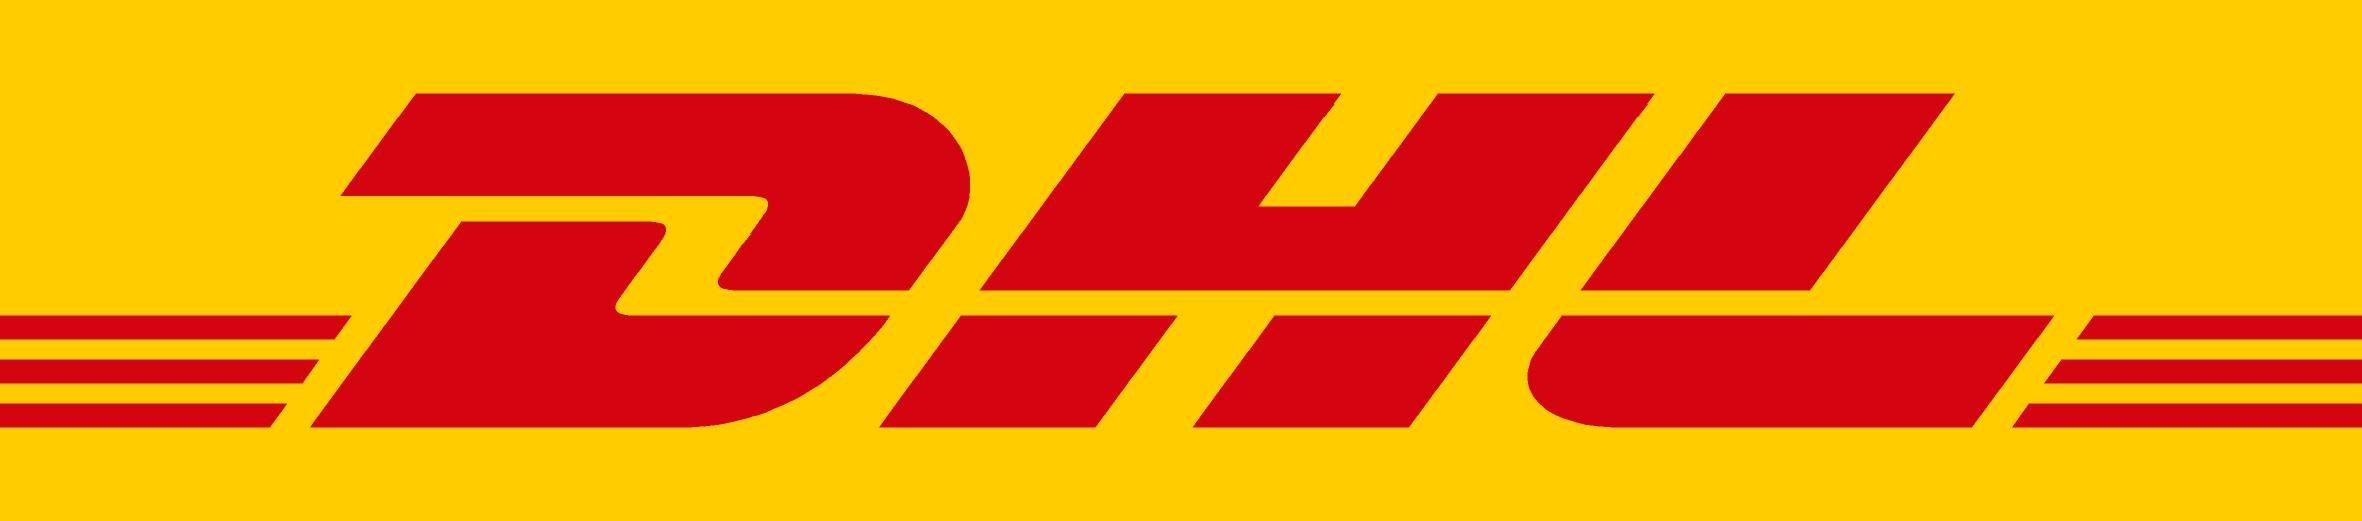 Логотип компании DLH